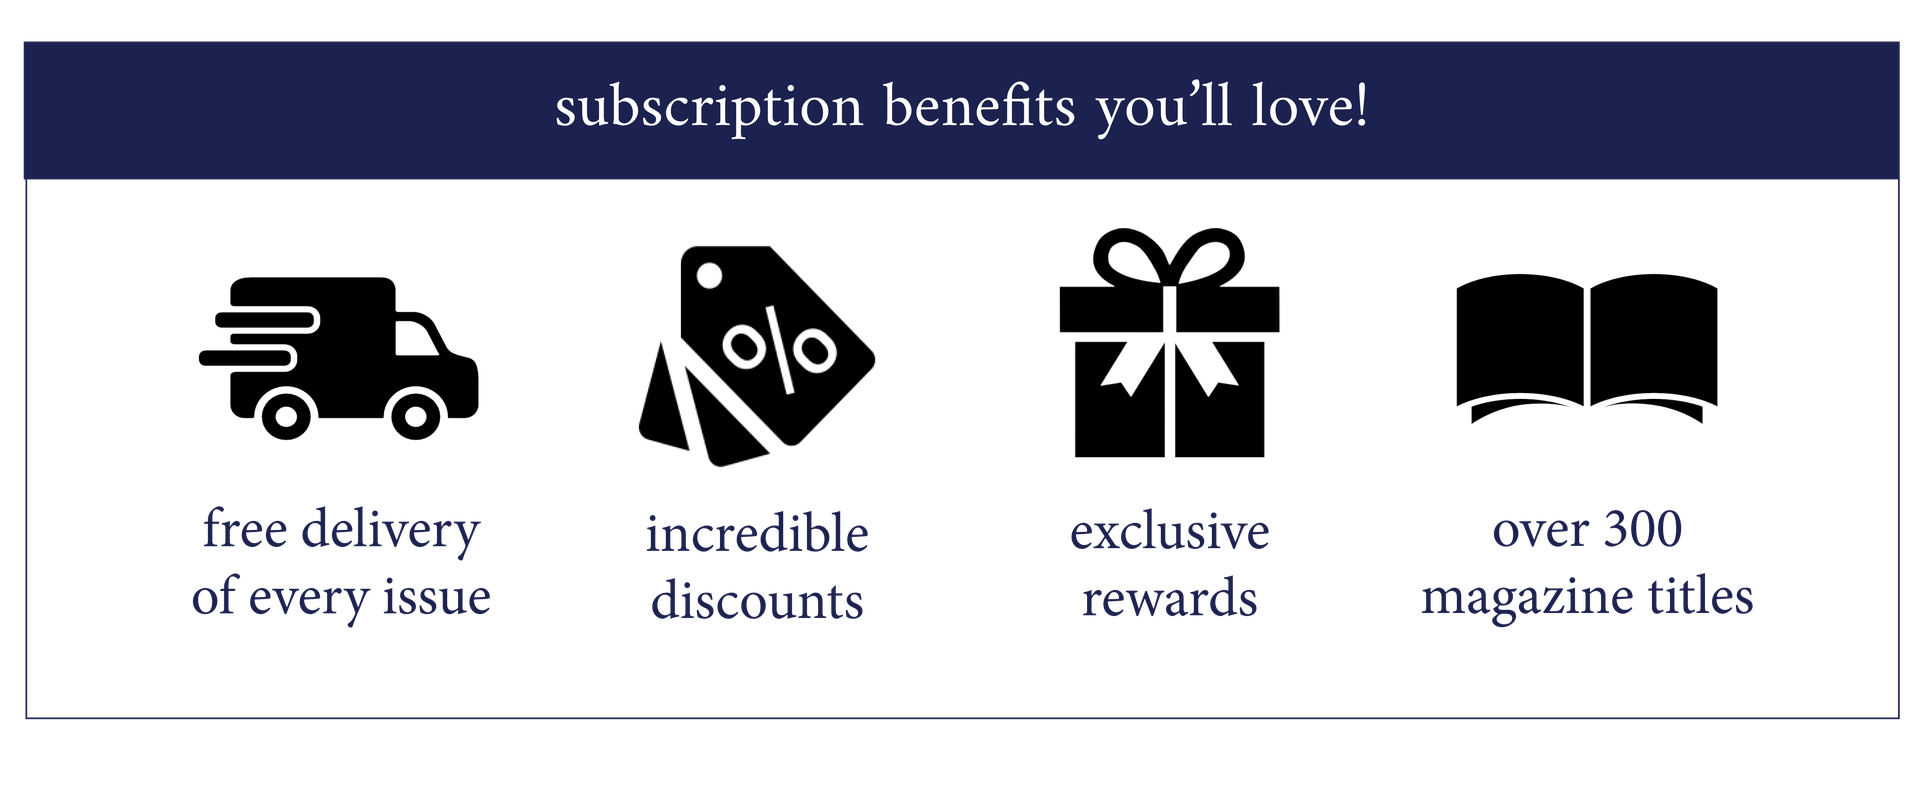 subscription benefits